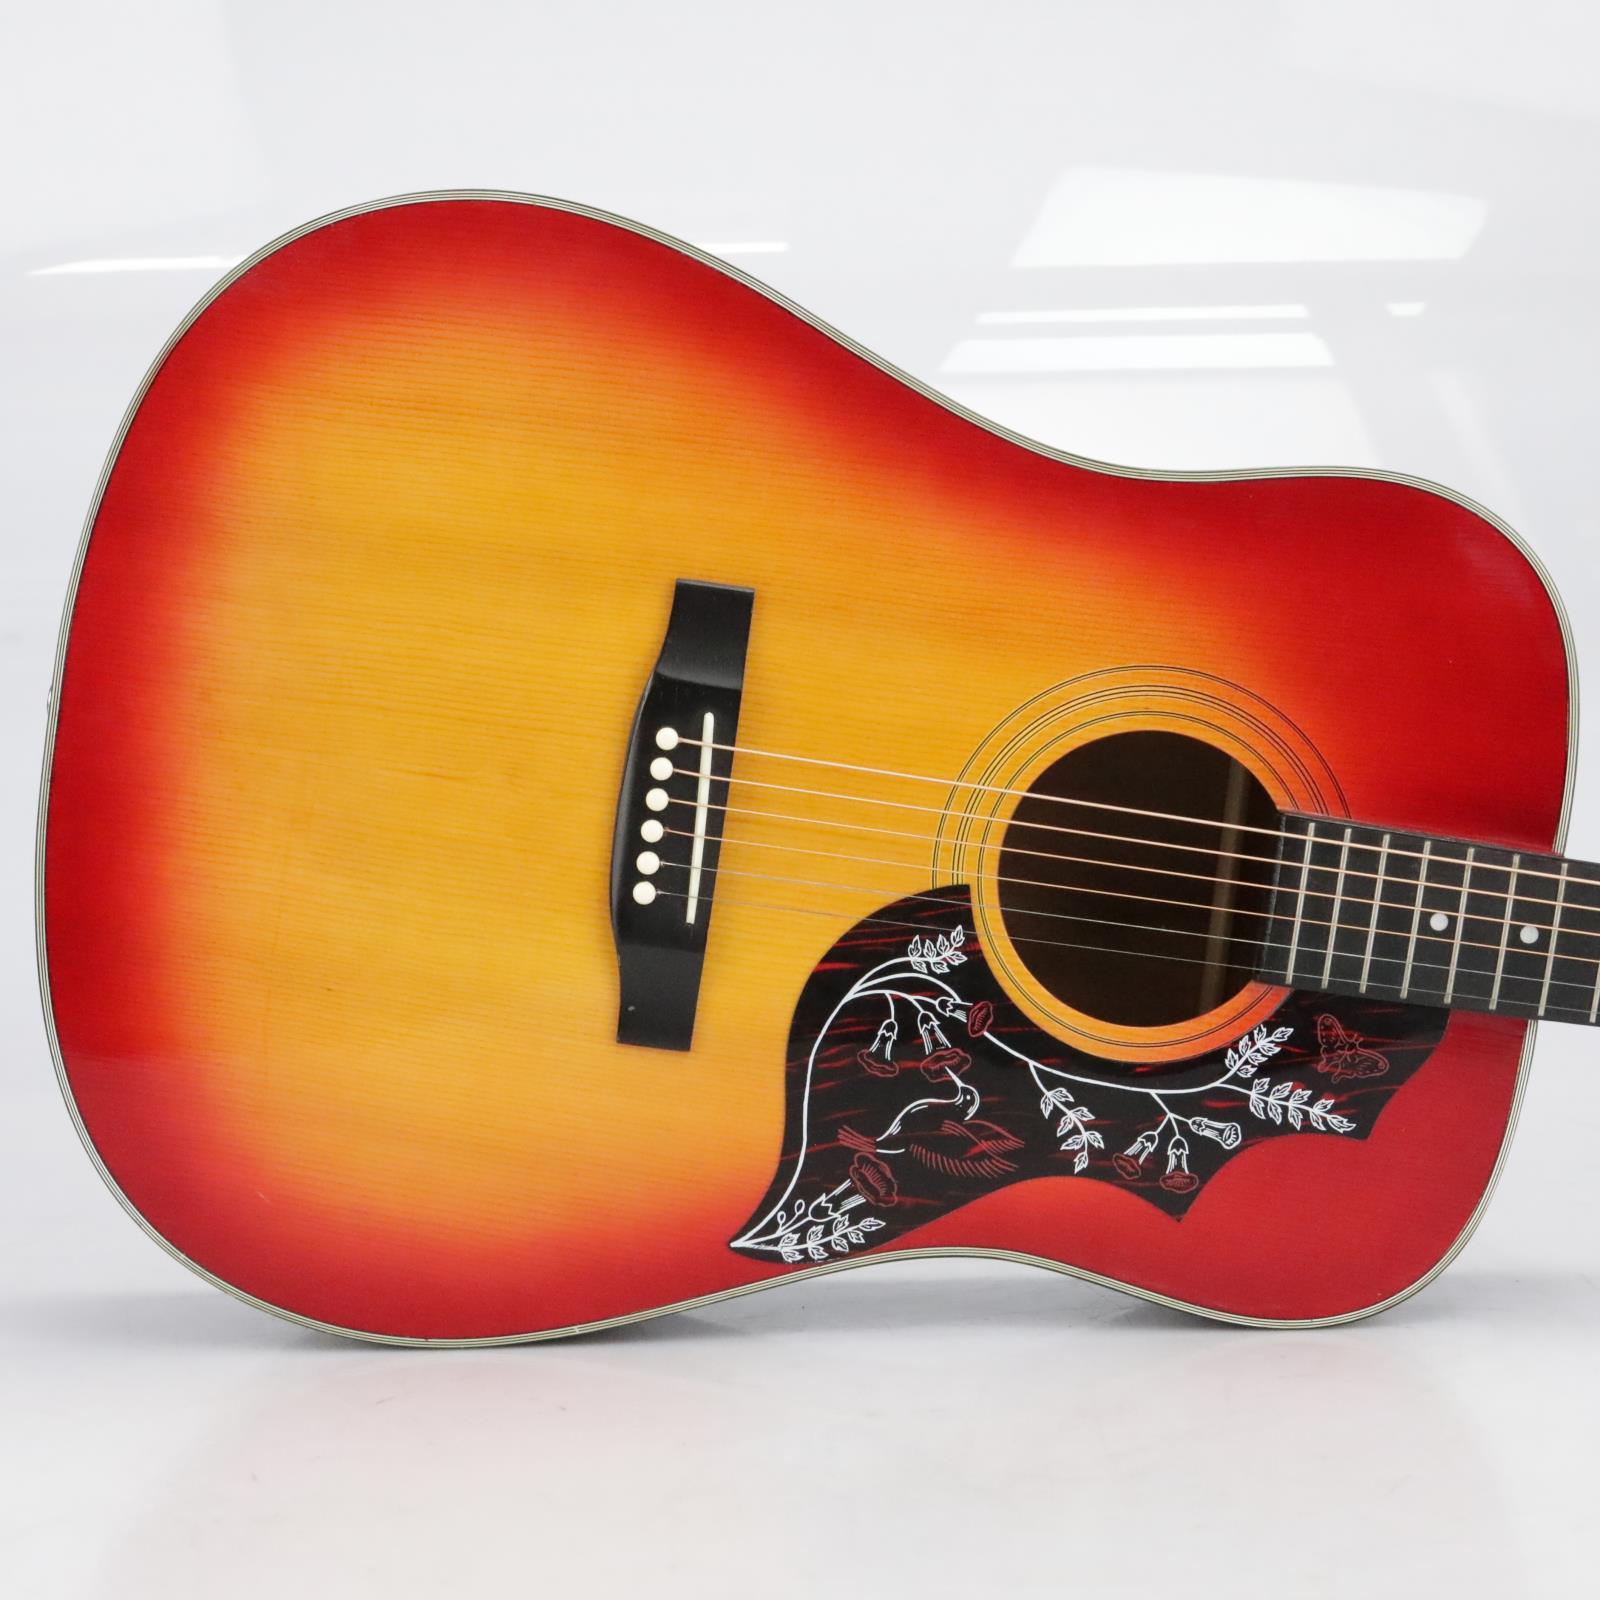 Synsonics Hummingbird Acoustic Guitar Sunburst w/ Hard Shell Case #40768